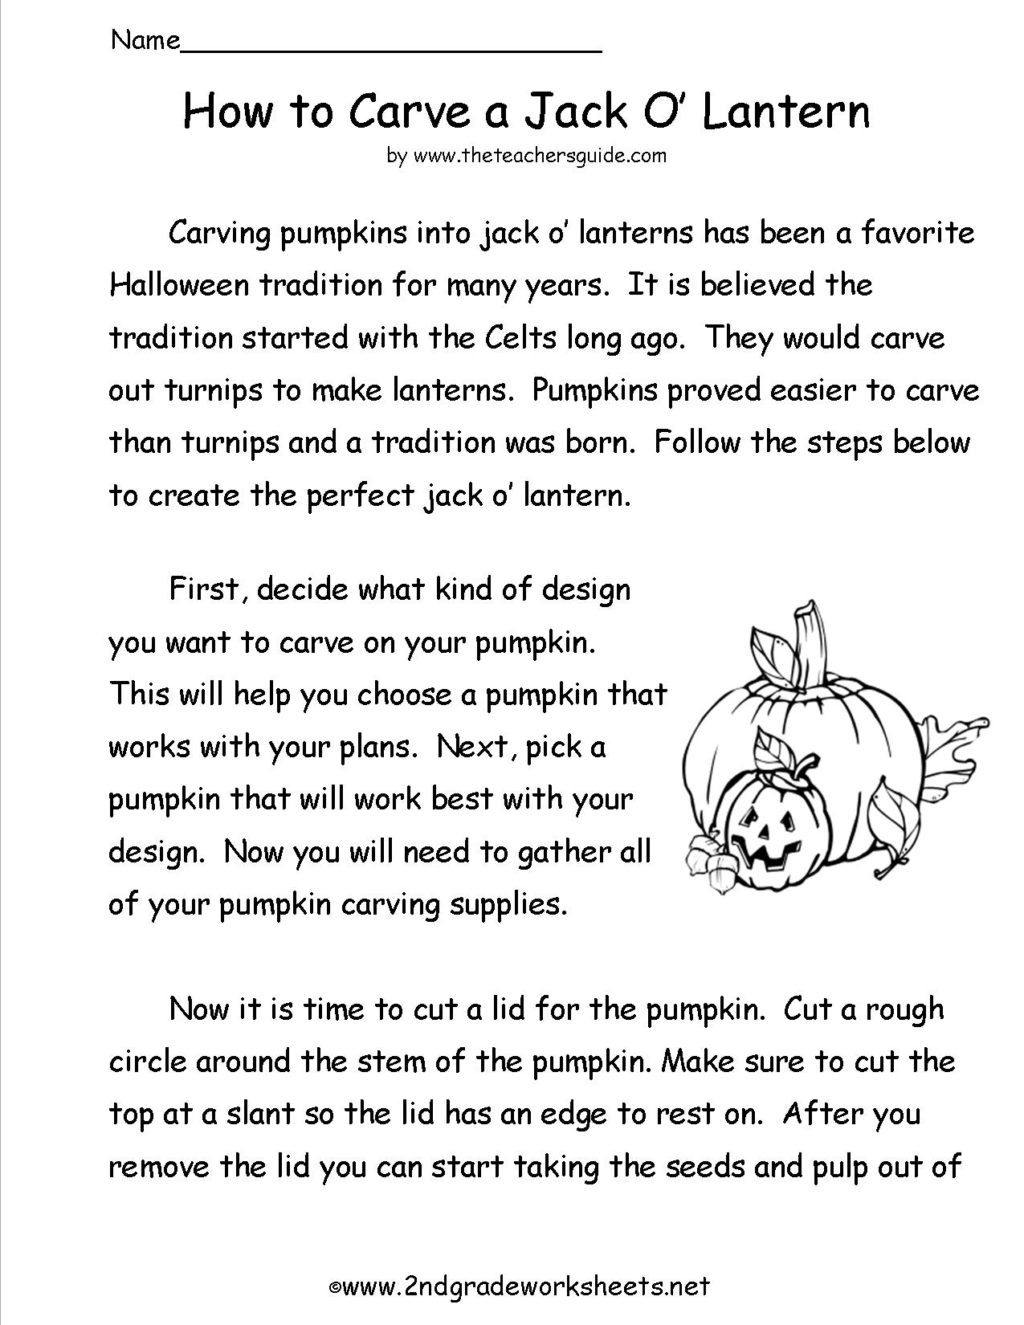 Worksheet ~ Halloween Worksheets And Printouts Carveapumpkin